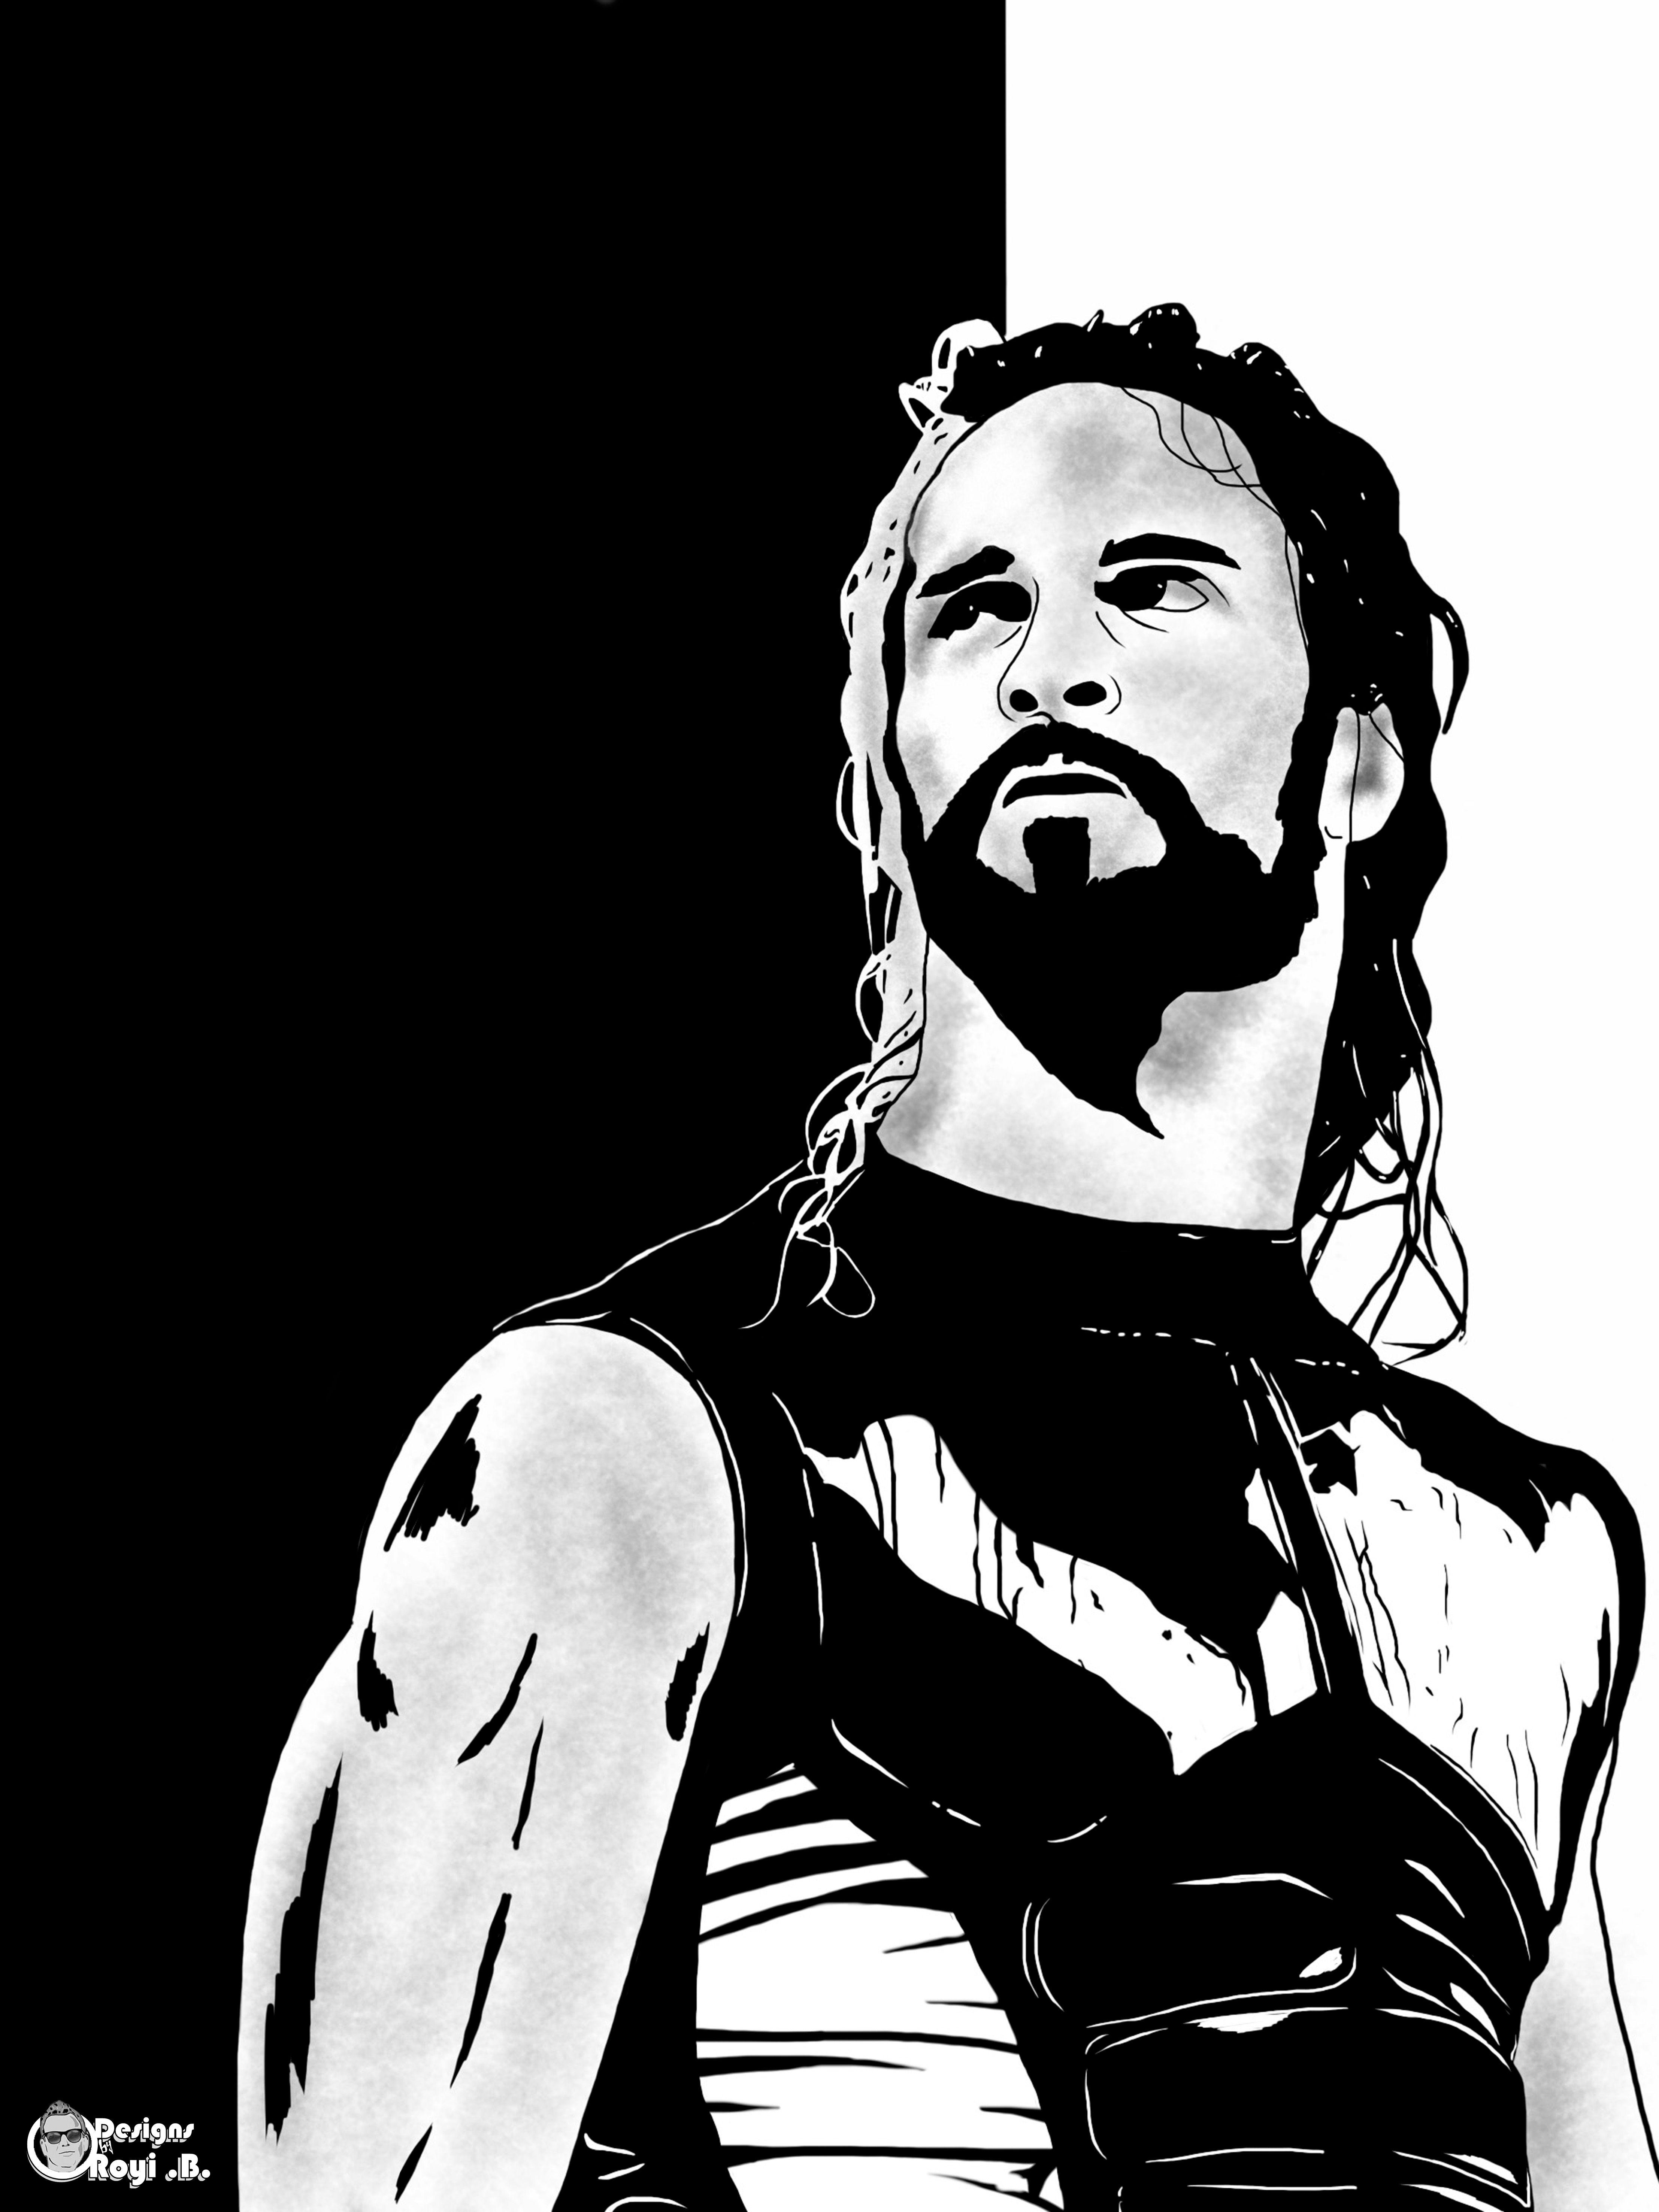 Seth Rollins | wwe | Pinterest | De lucha libre, WWE y Lucha libre